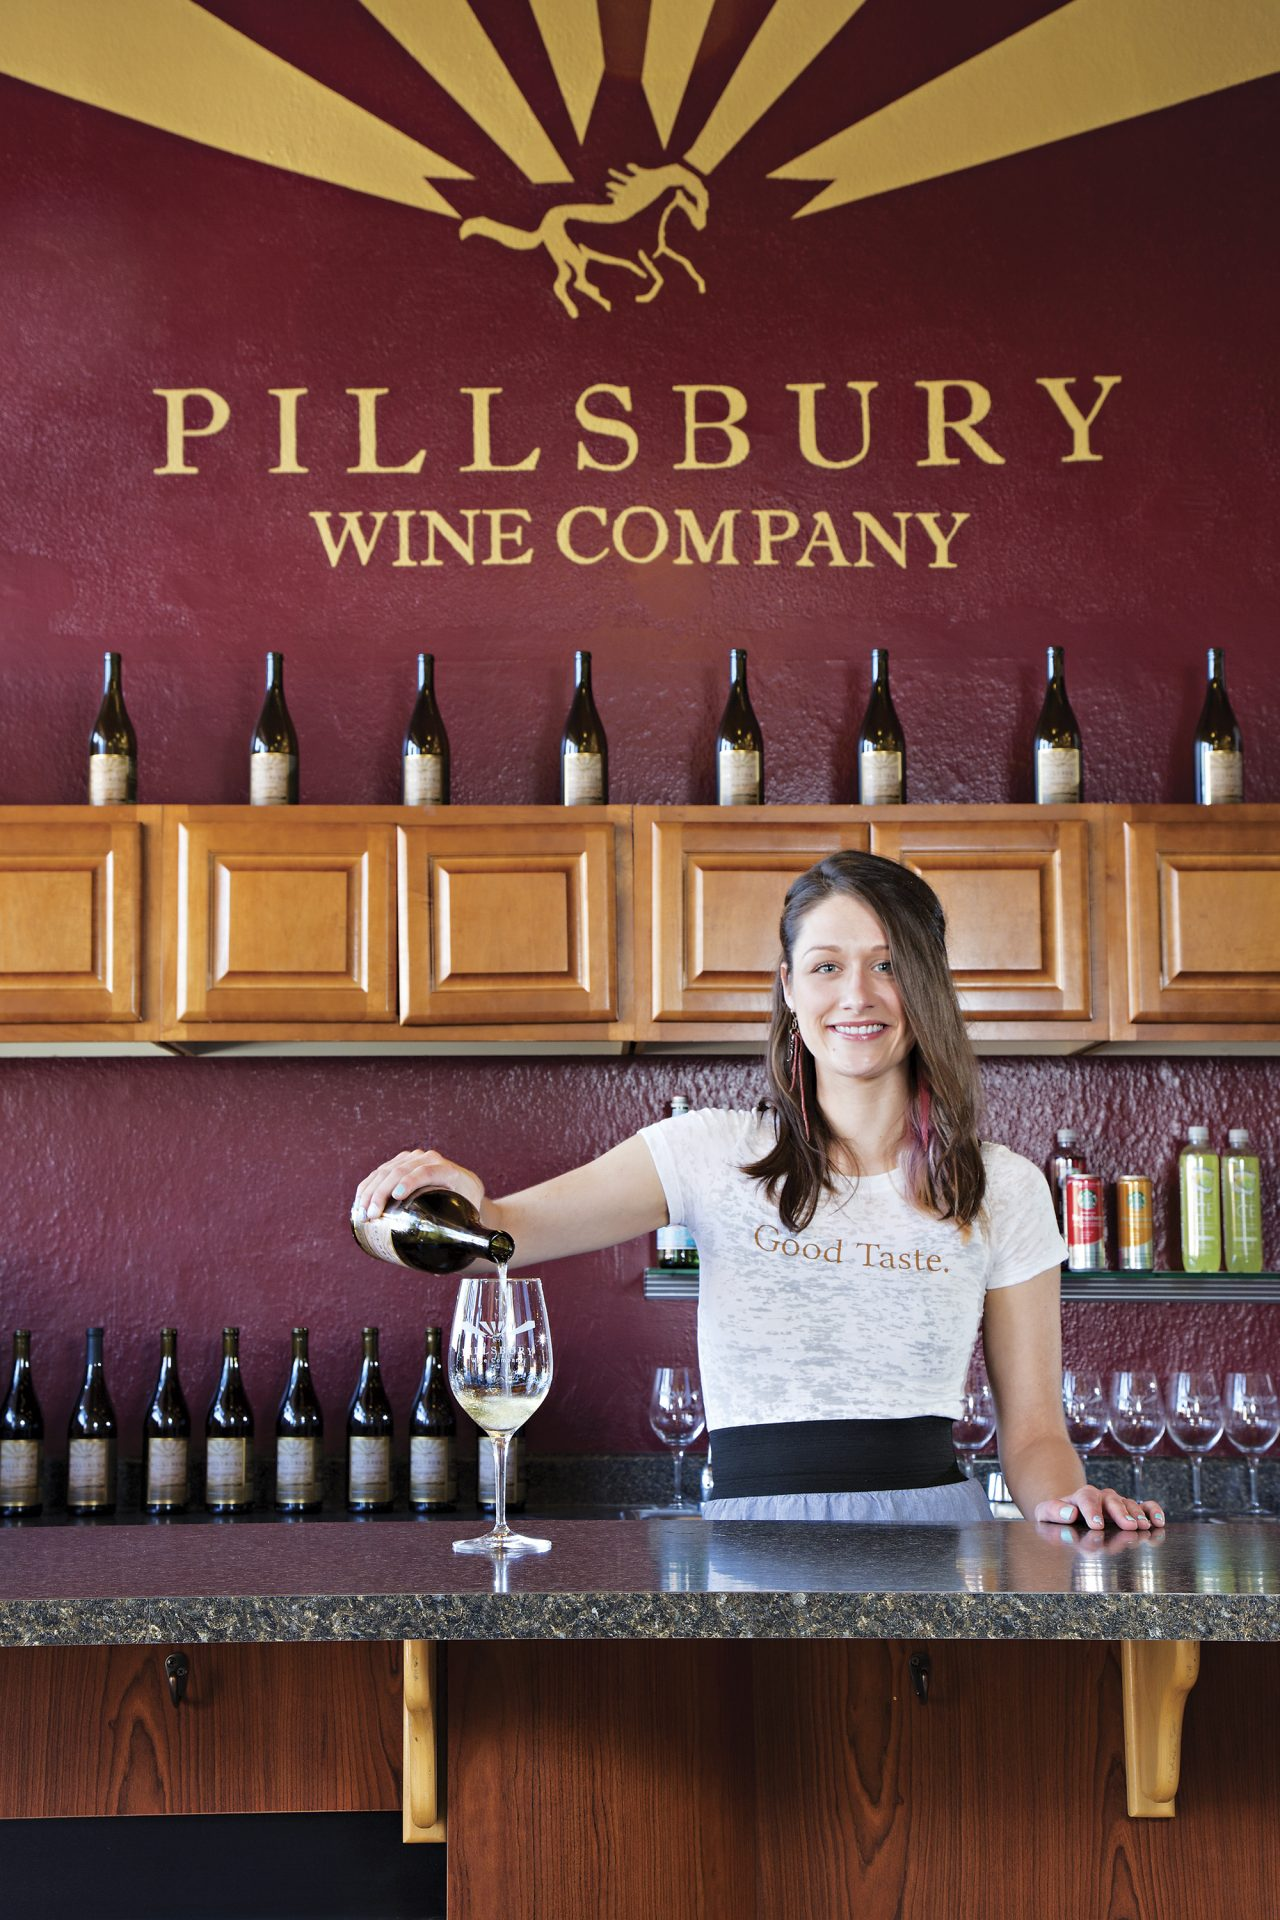 Pillsbury Wine Company; Photo by Richard Maack